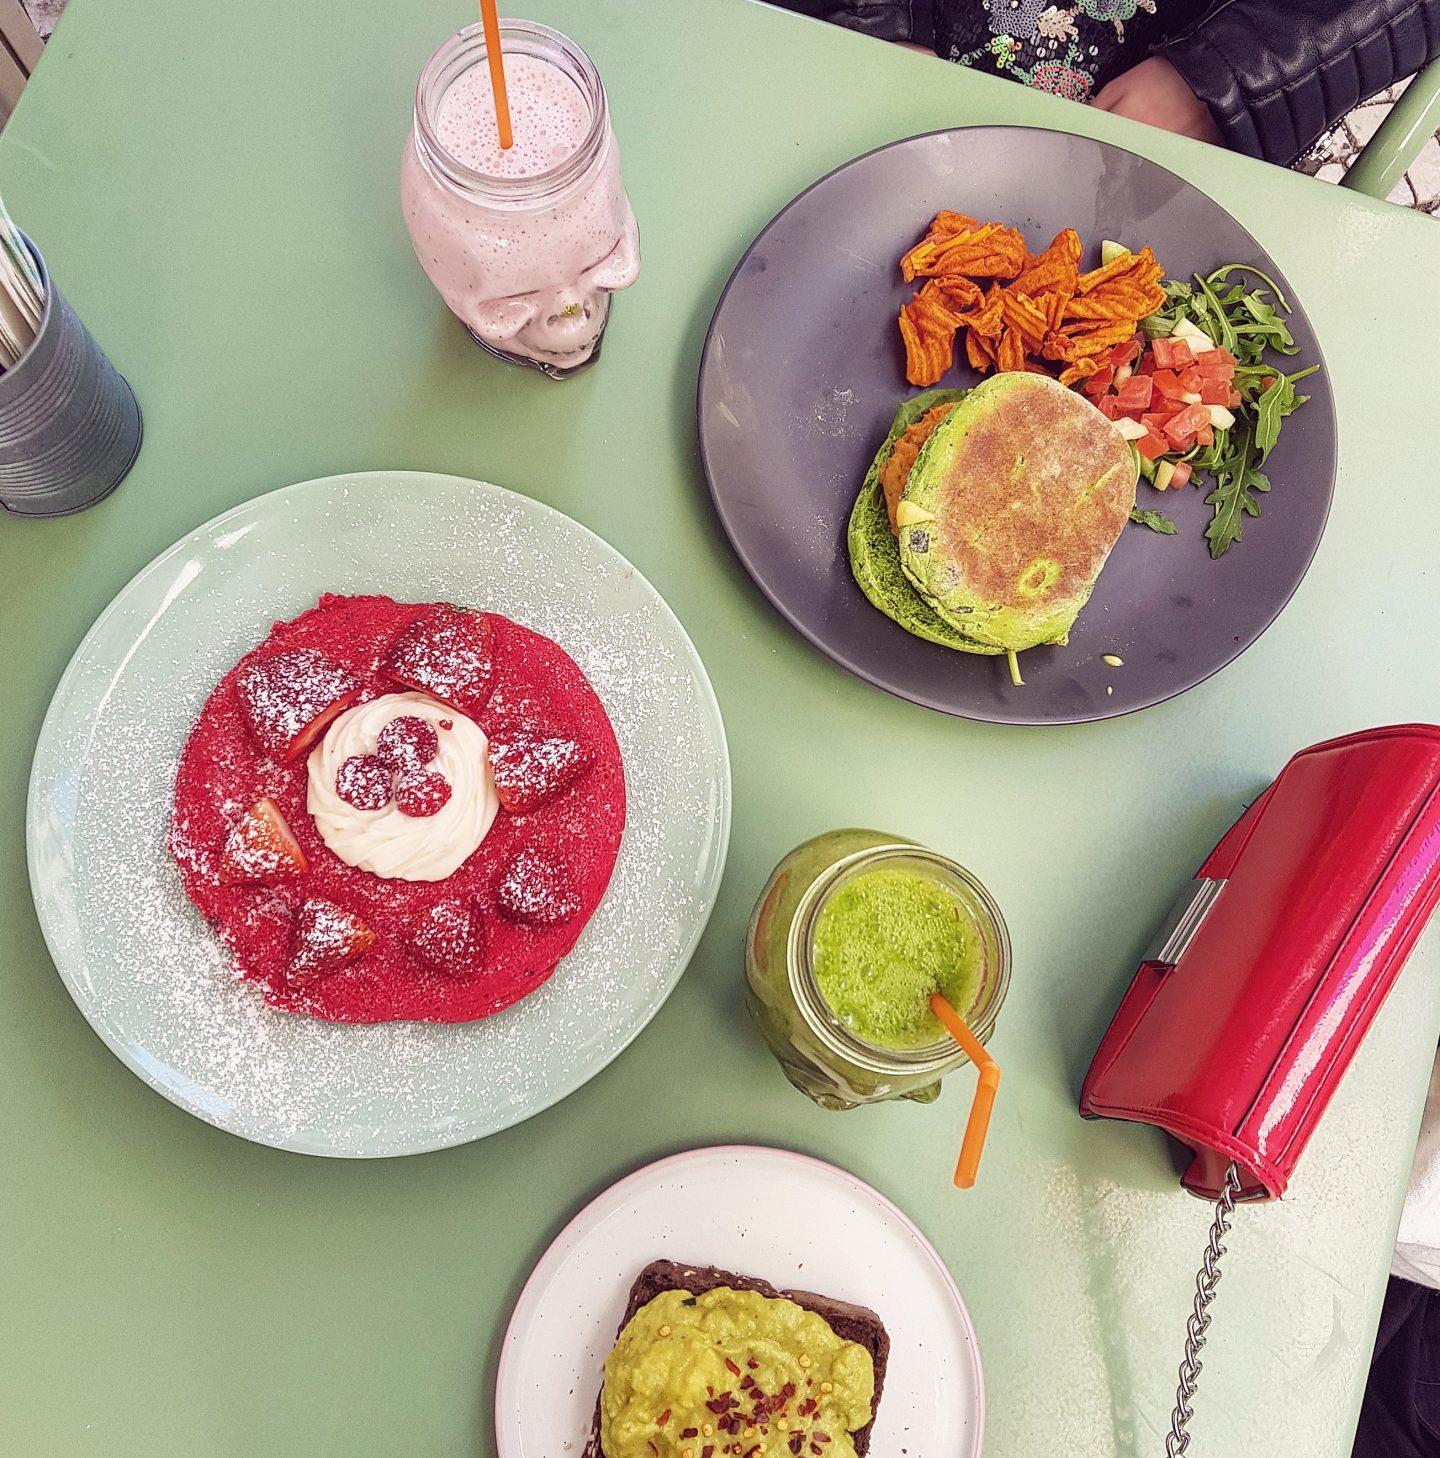 Food hotspot #4 | Nicolau Café in Lissabon!